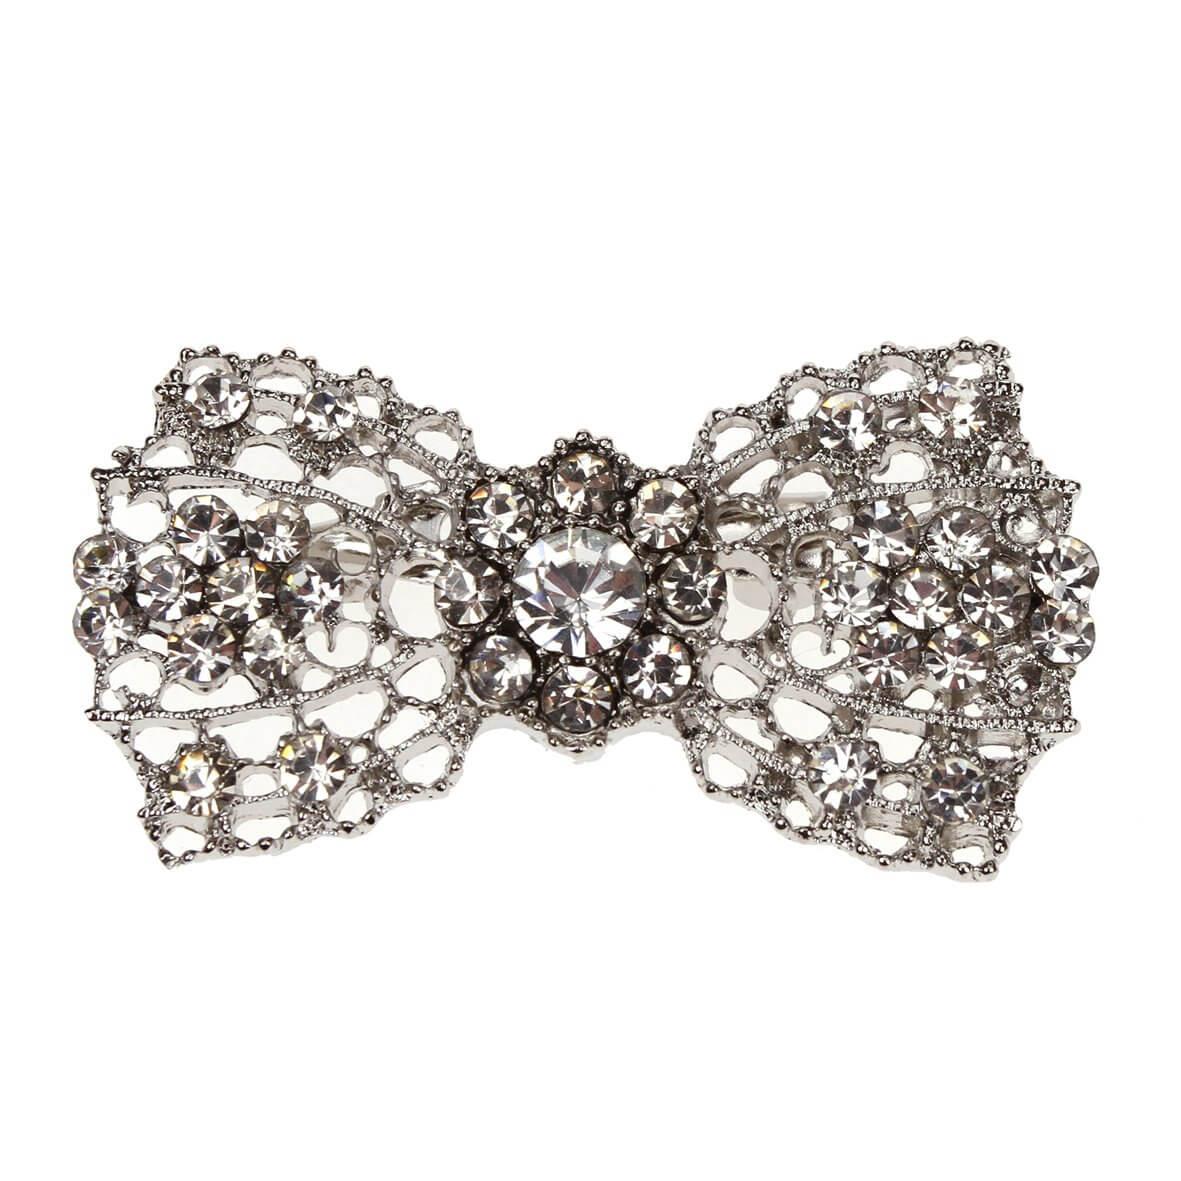 Vintage Bow (Embellishment)